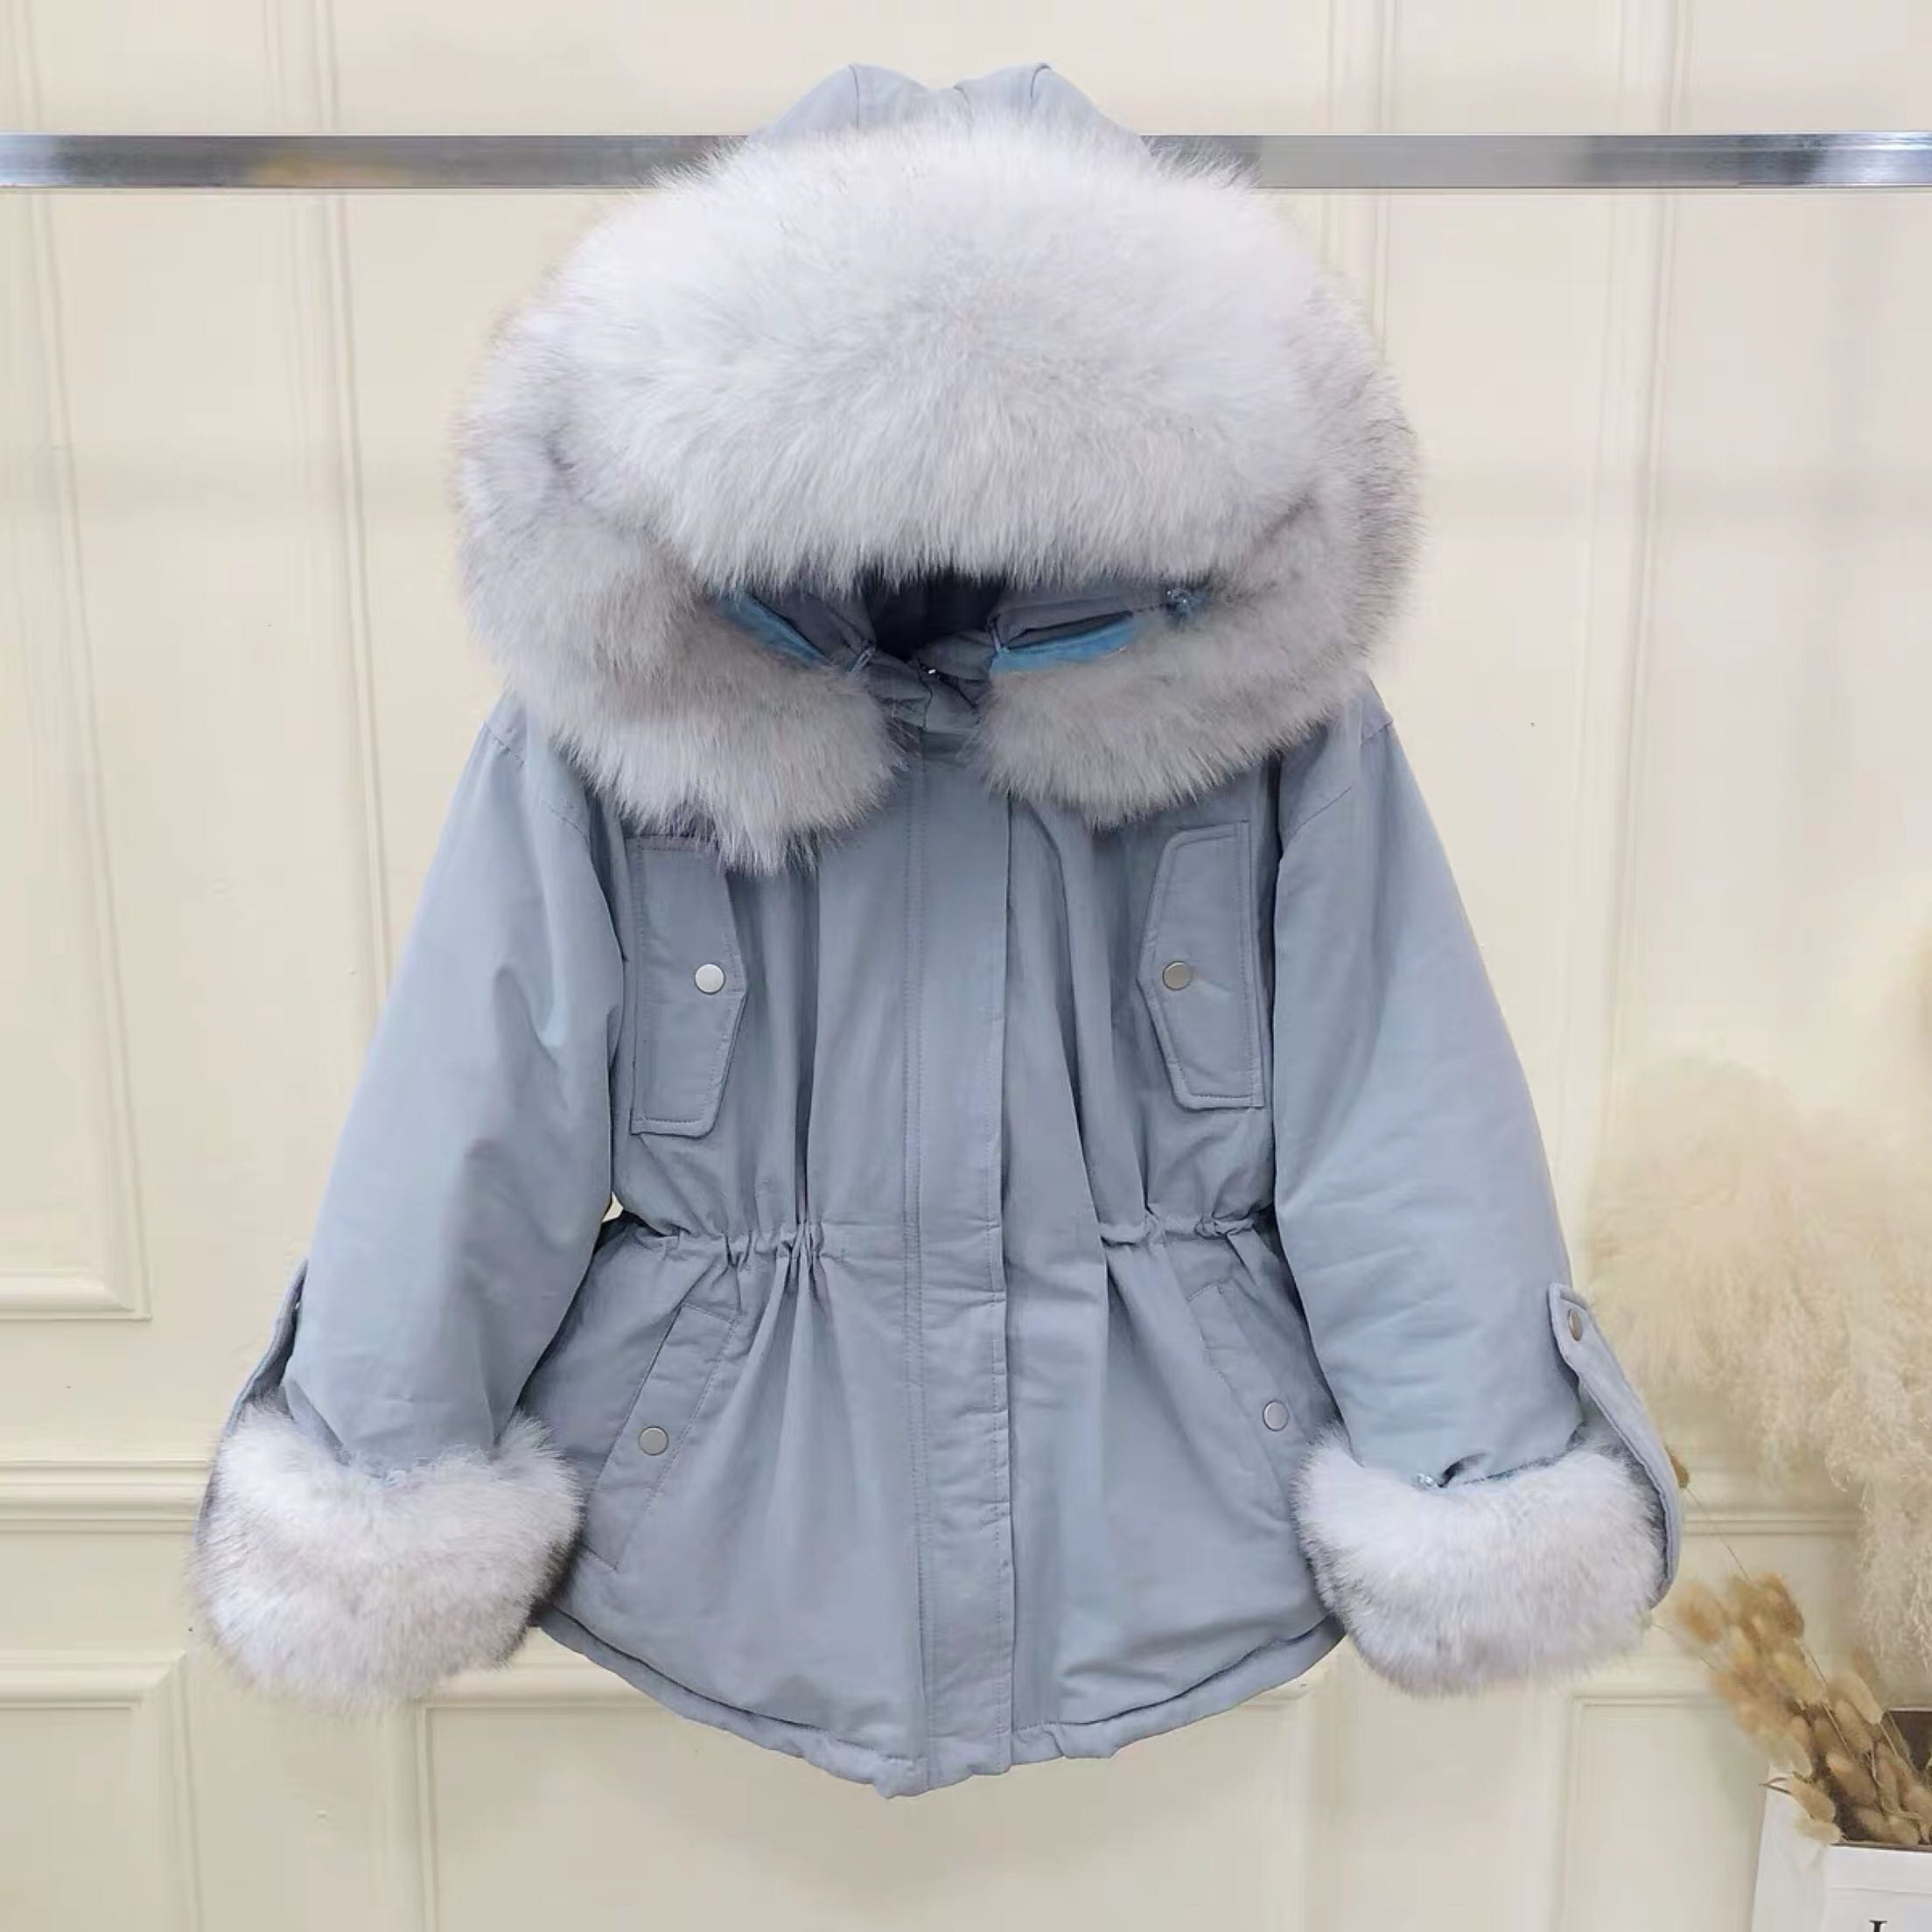 Real Natural Fox Fur 2019 Winter Jacket Women Women White Duck Down Jacket Thick Warm Female Winter Coat Women Hooded Down Parka